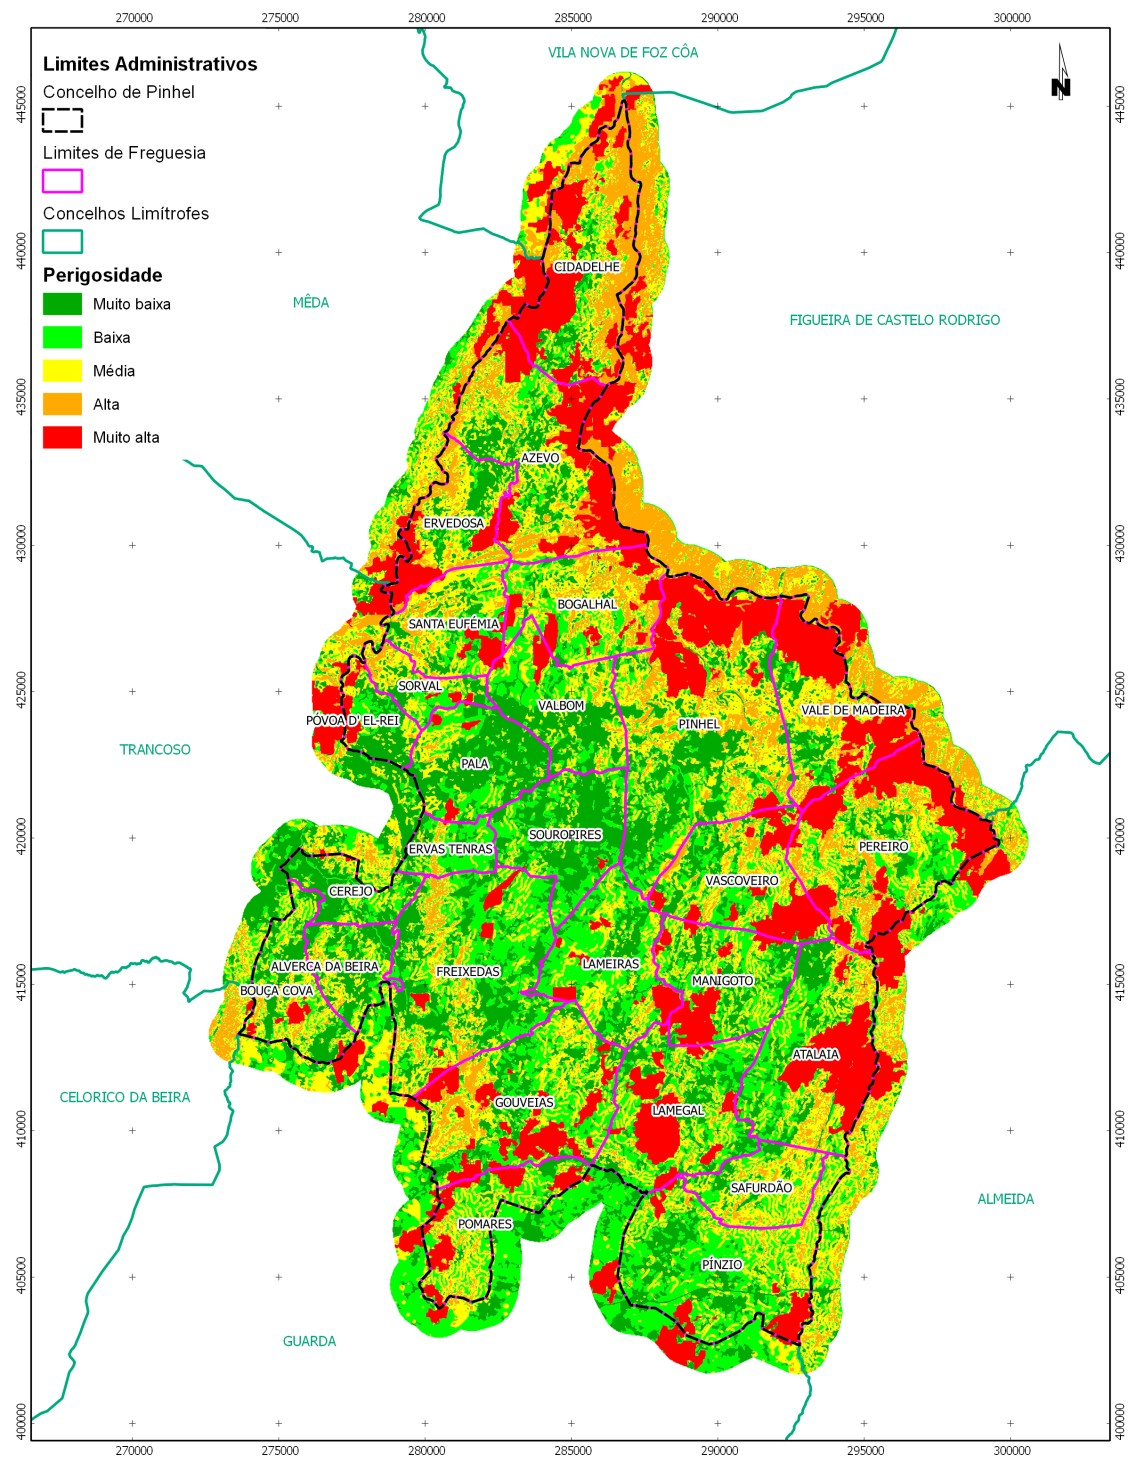 pinhel mapa QGIS y el Mapeo de Riesgo de Incendio Forestal en Portugal pinhel mapa